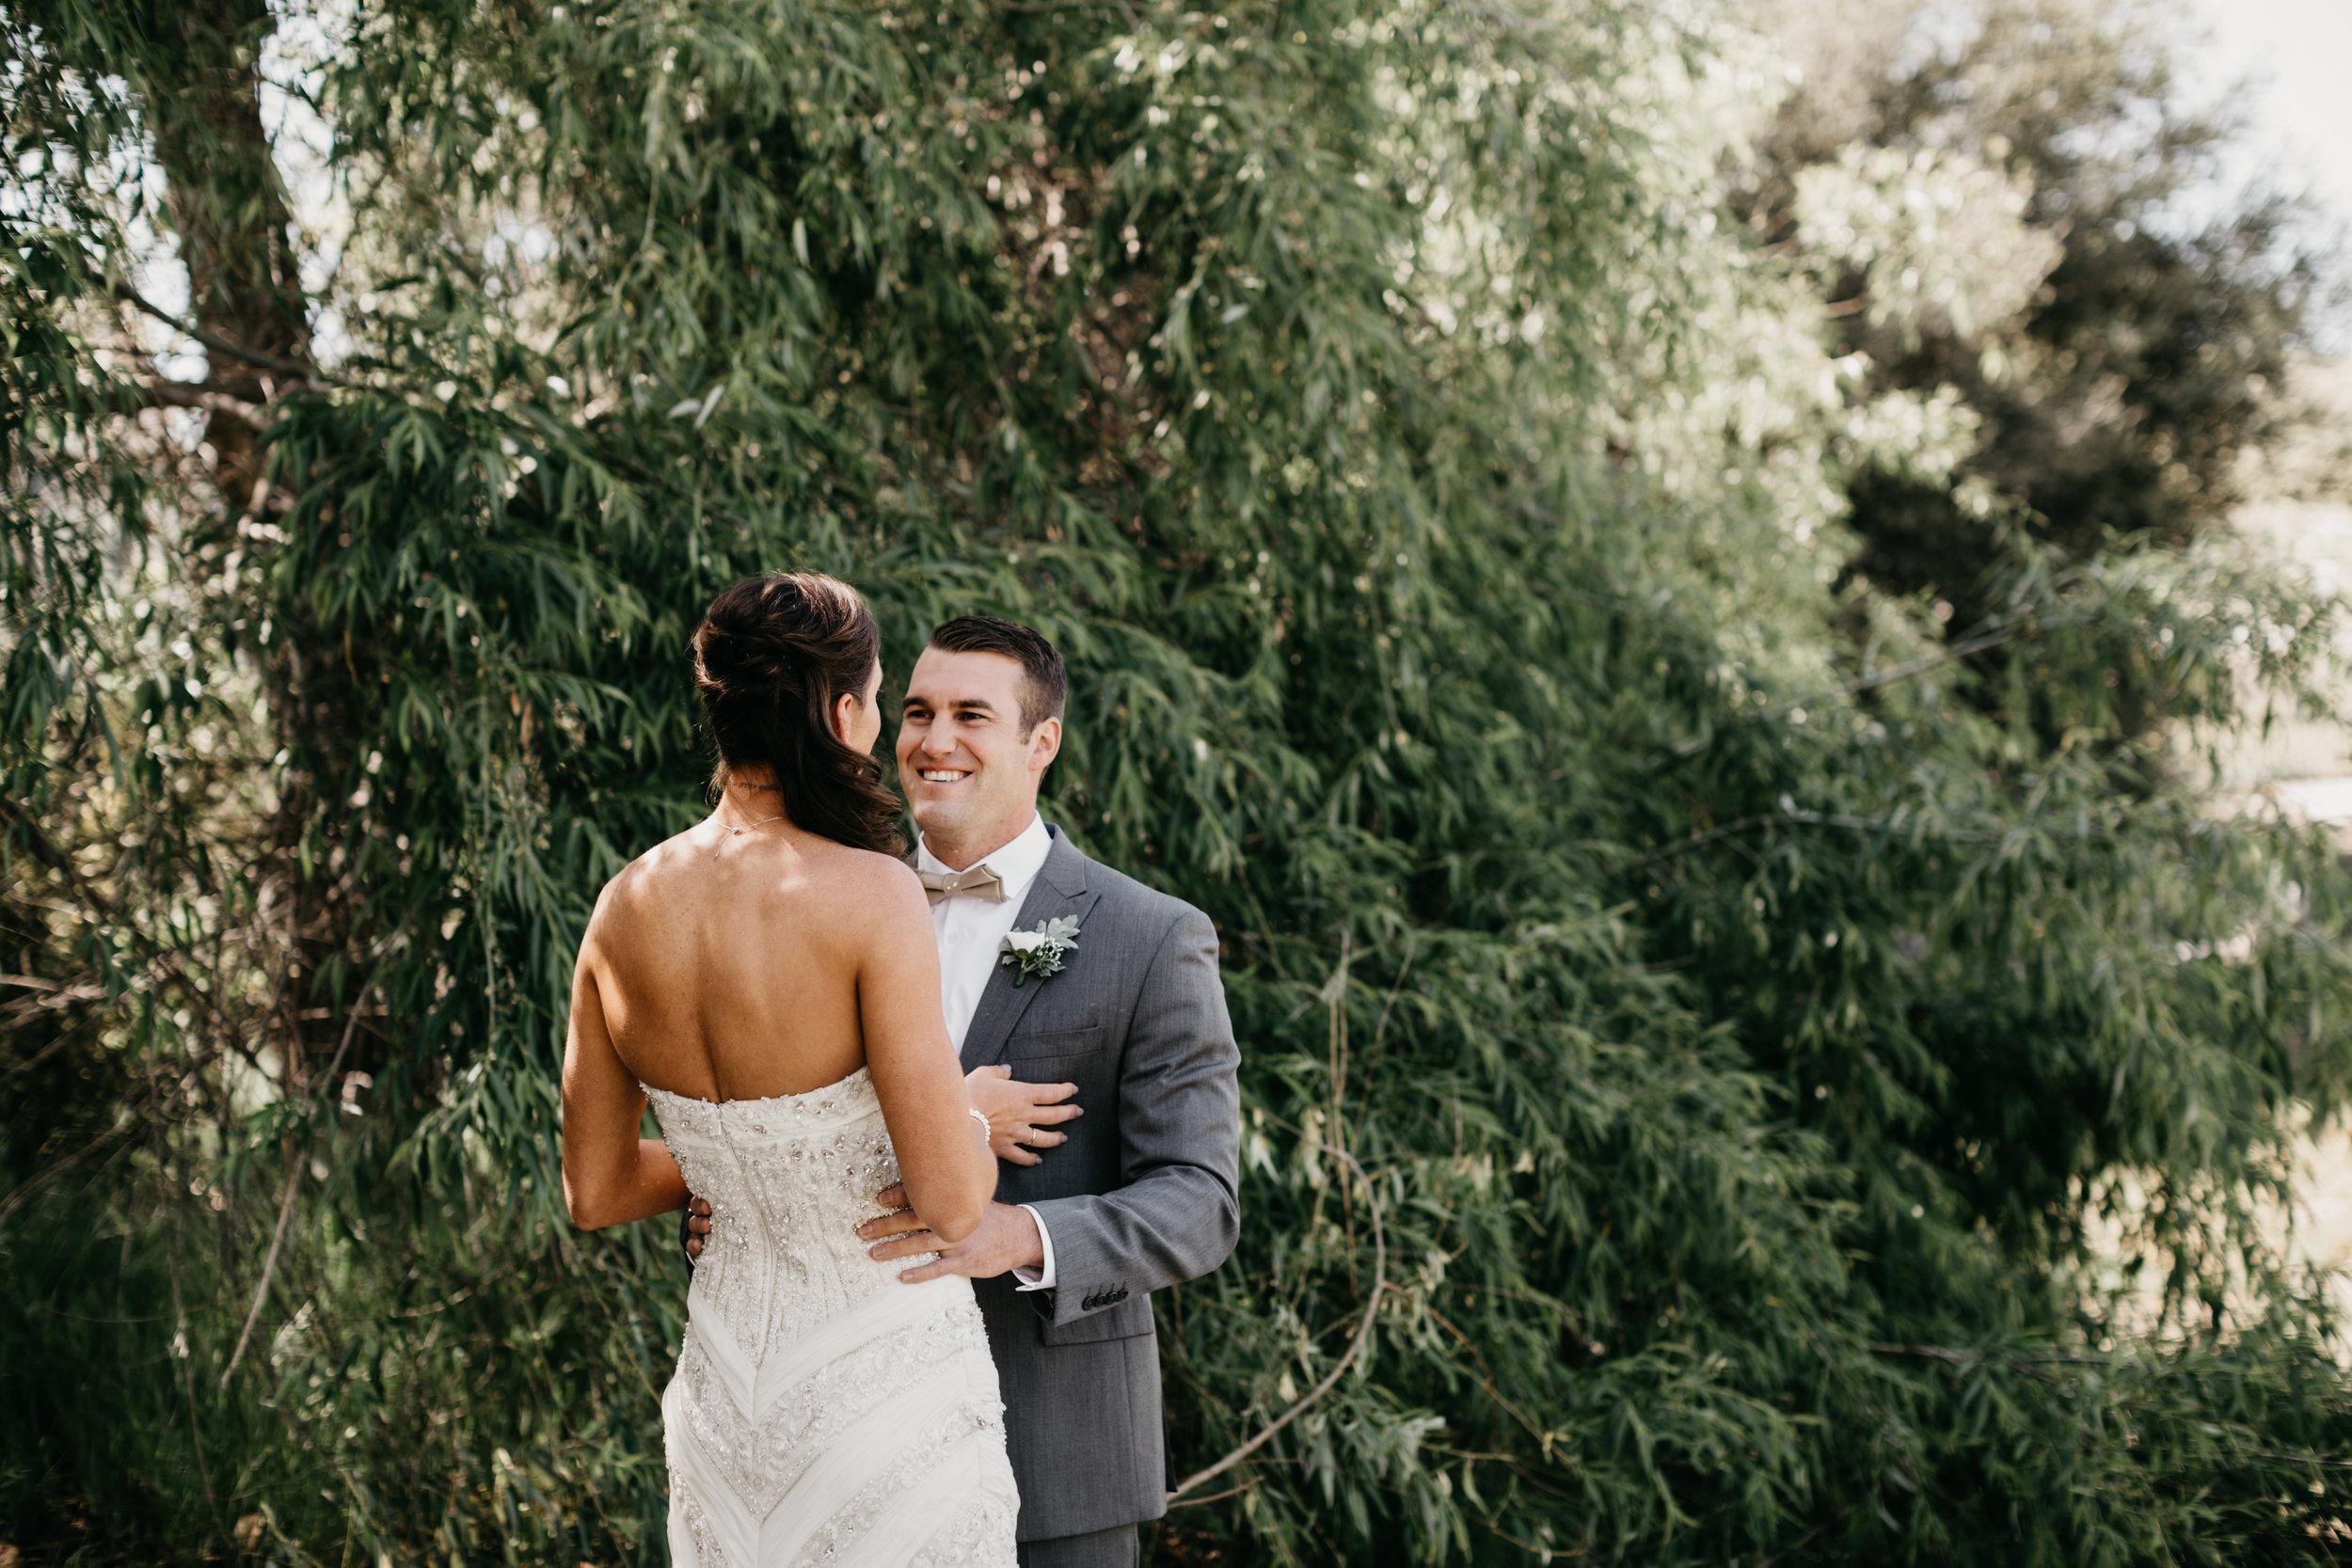 C+J-Grace-Maralyn-Estate-Wedding-Diana-Lake-Photography462.jpg